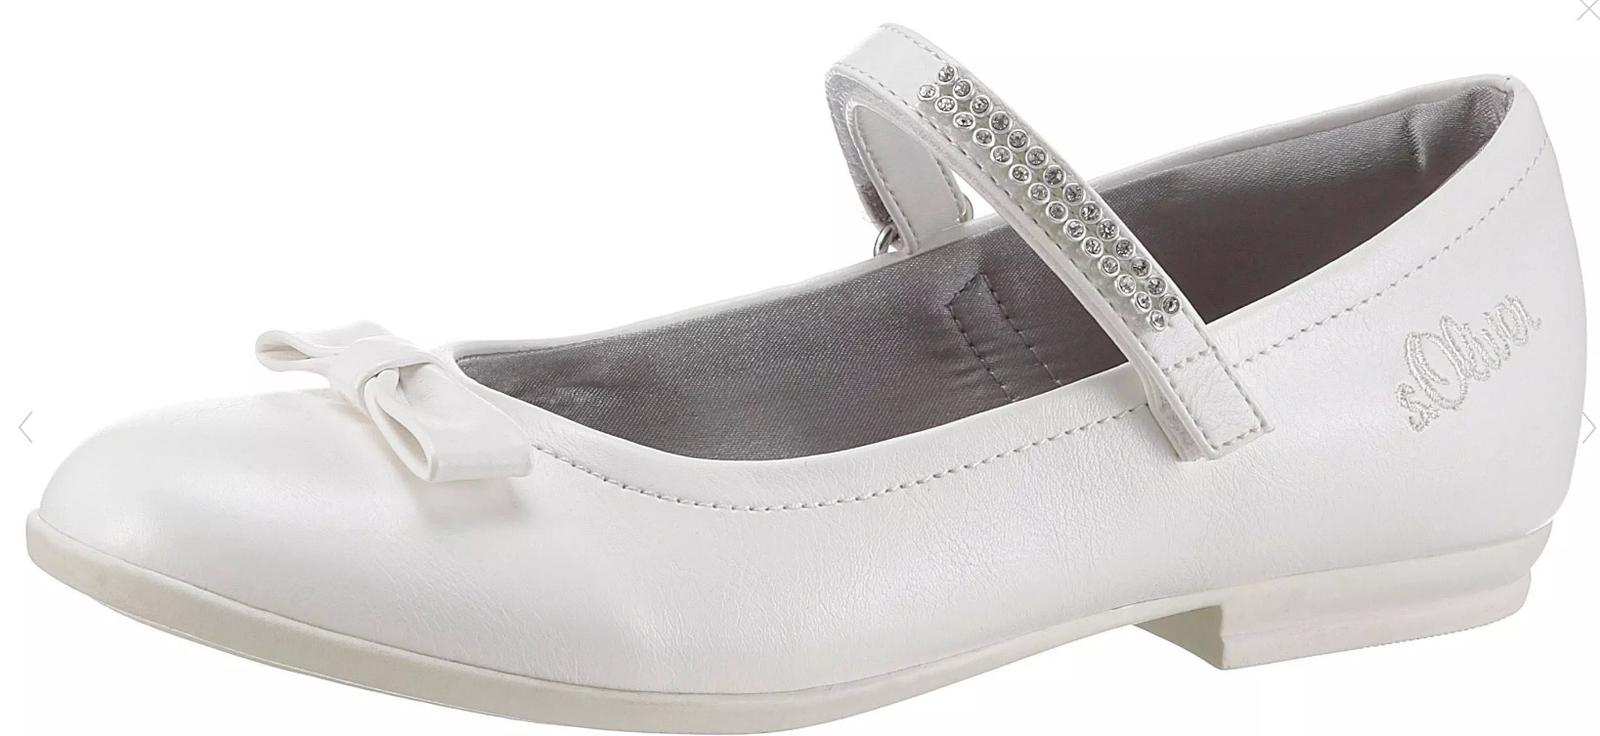 Svadobne / biele topanky - Obrázok č. 1